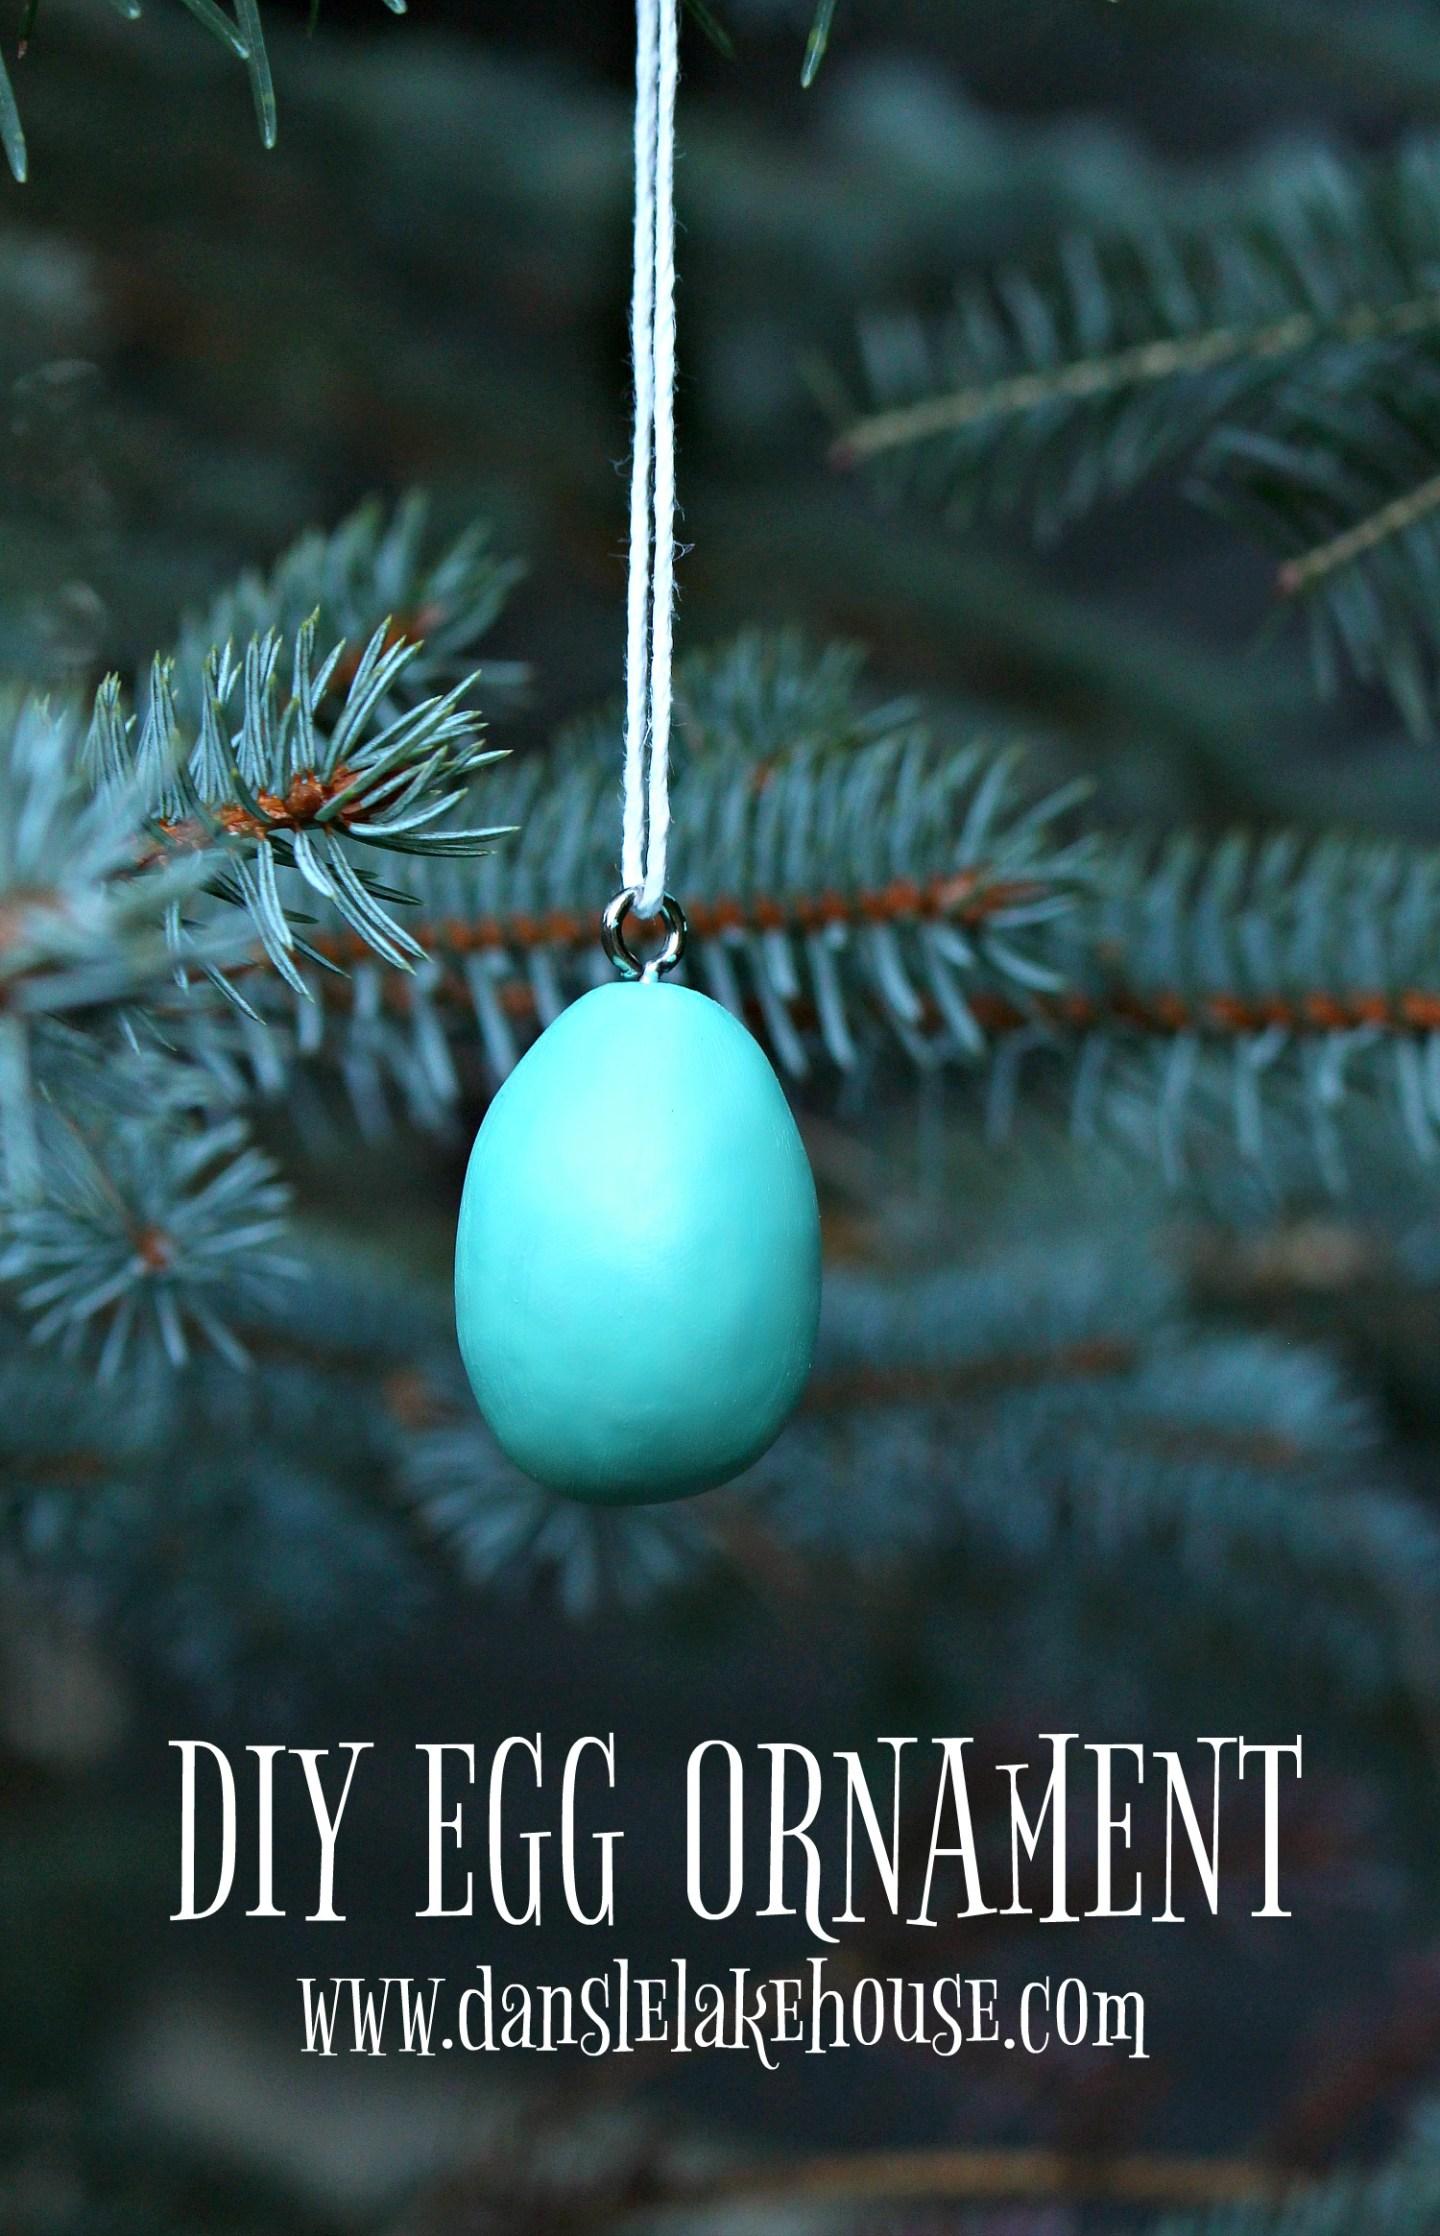 DIY Egg Christmas Tree Ornament